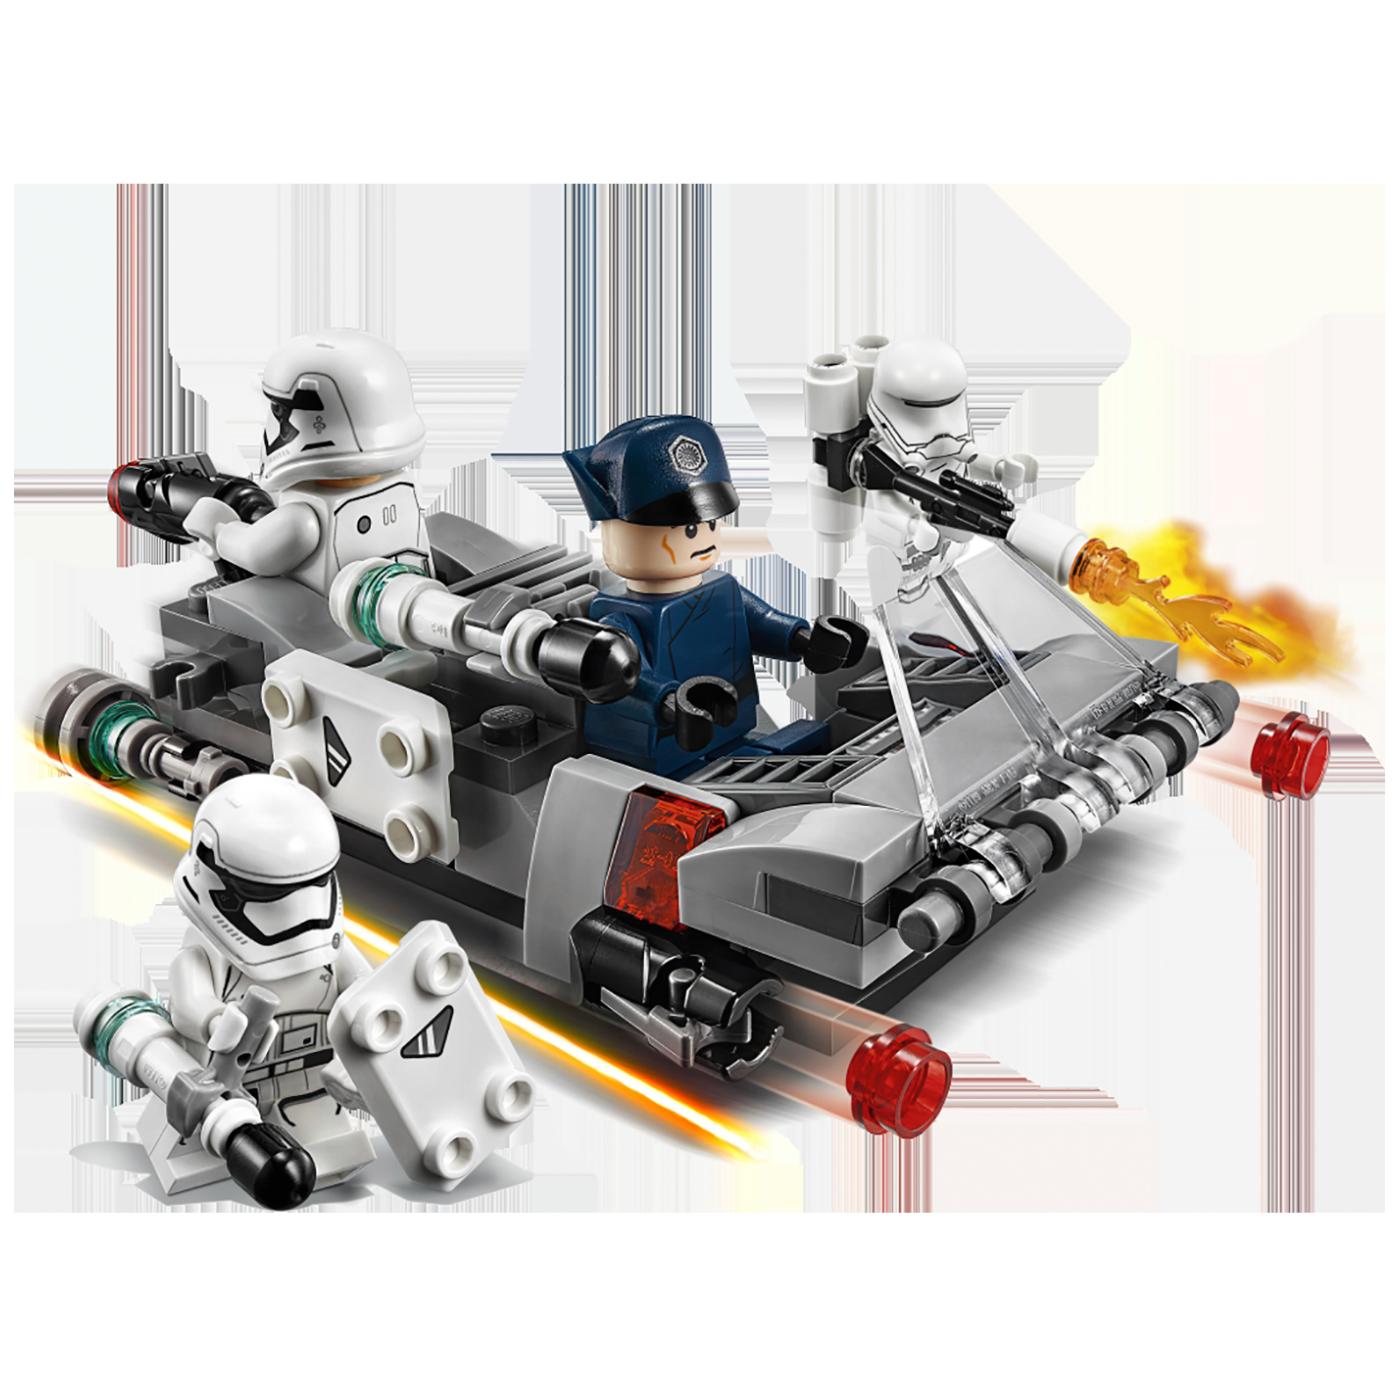 Transportni jurišnik Prvog reda, LEGO Star Wars